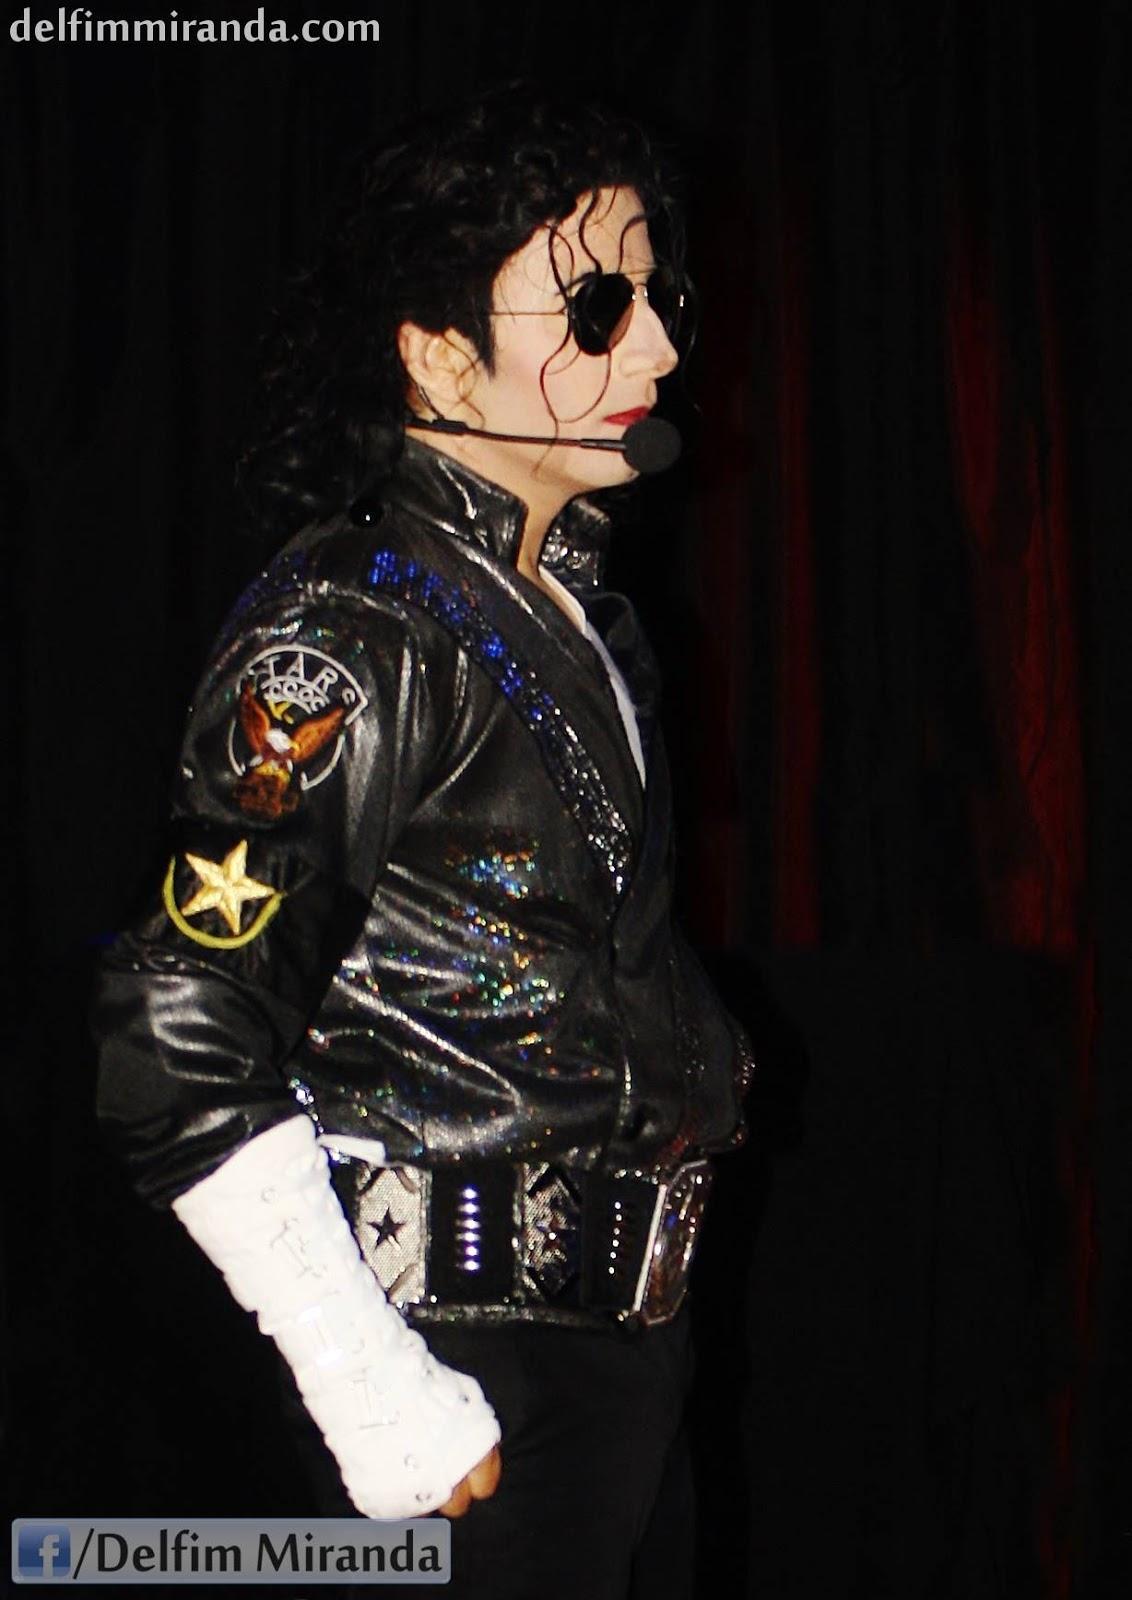 Delfim Miranda - Michael Jackson Tribute - Jam - Military Jacket